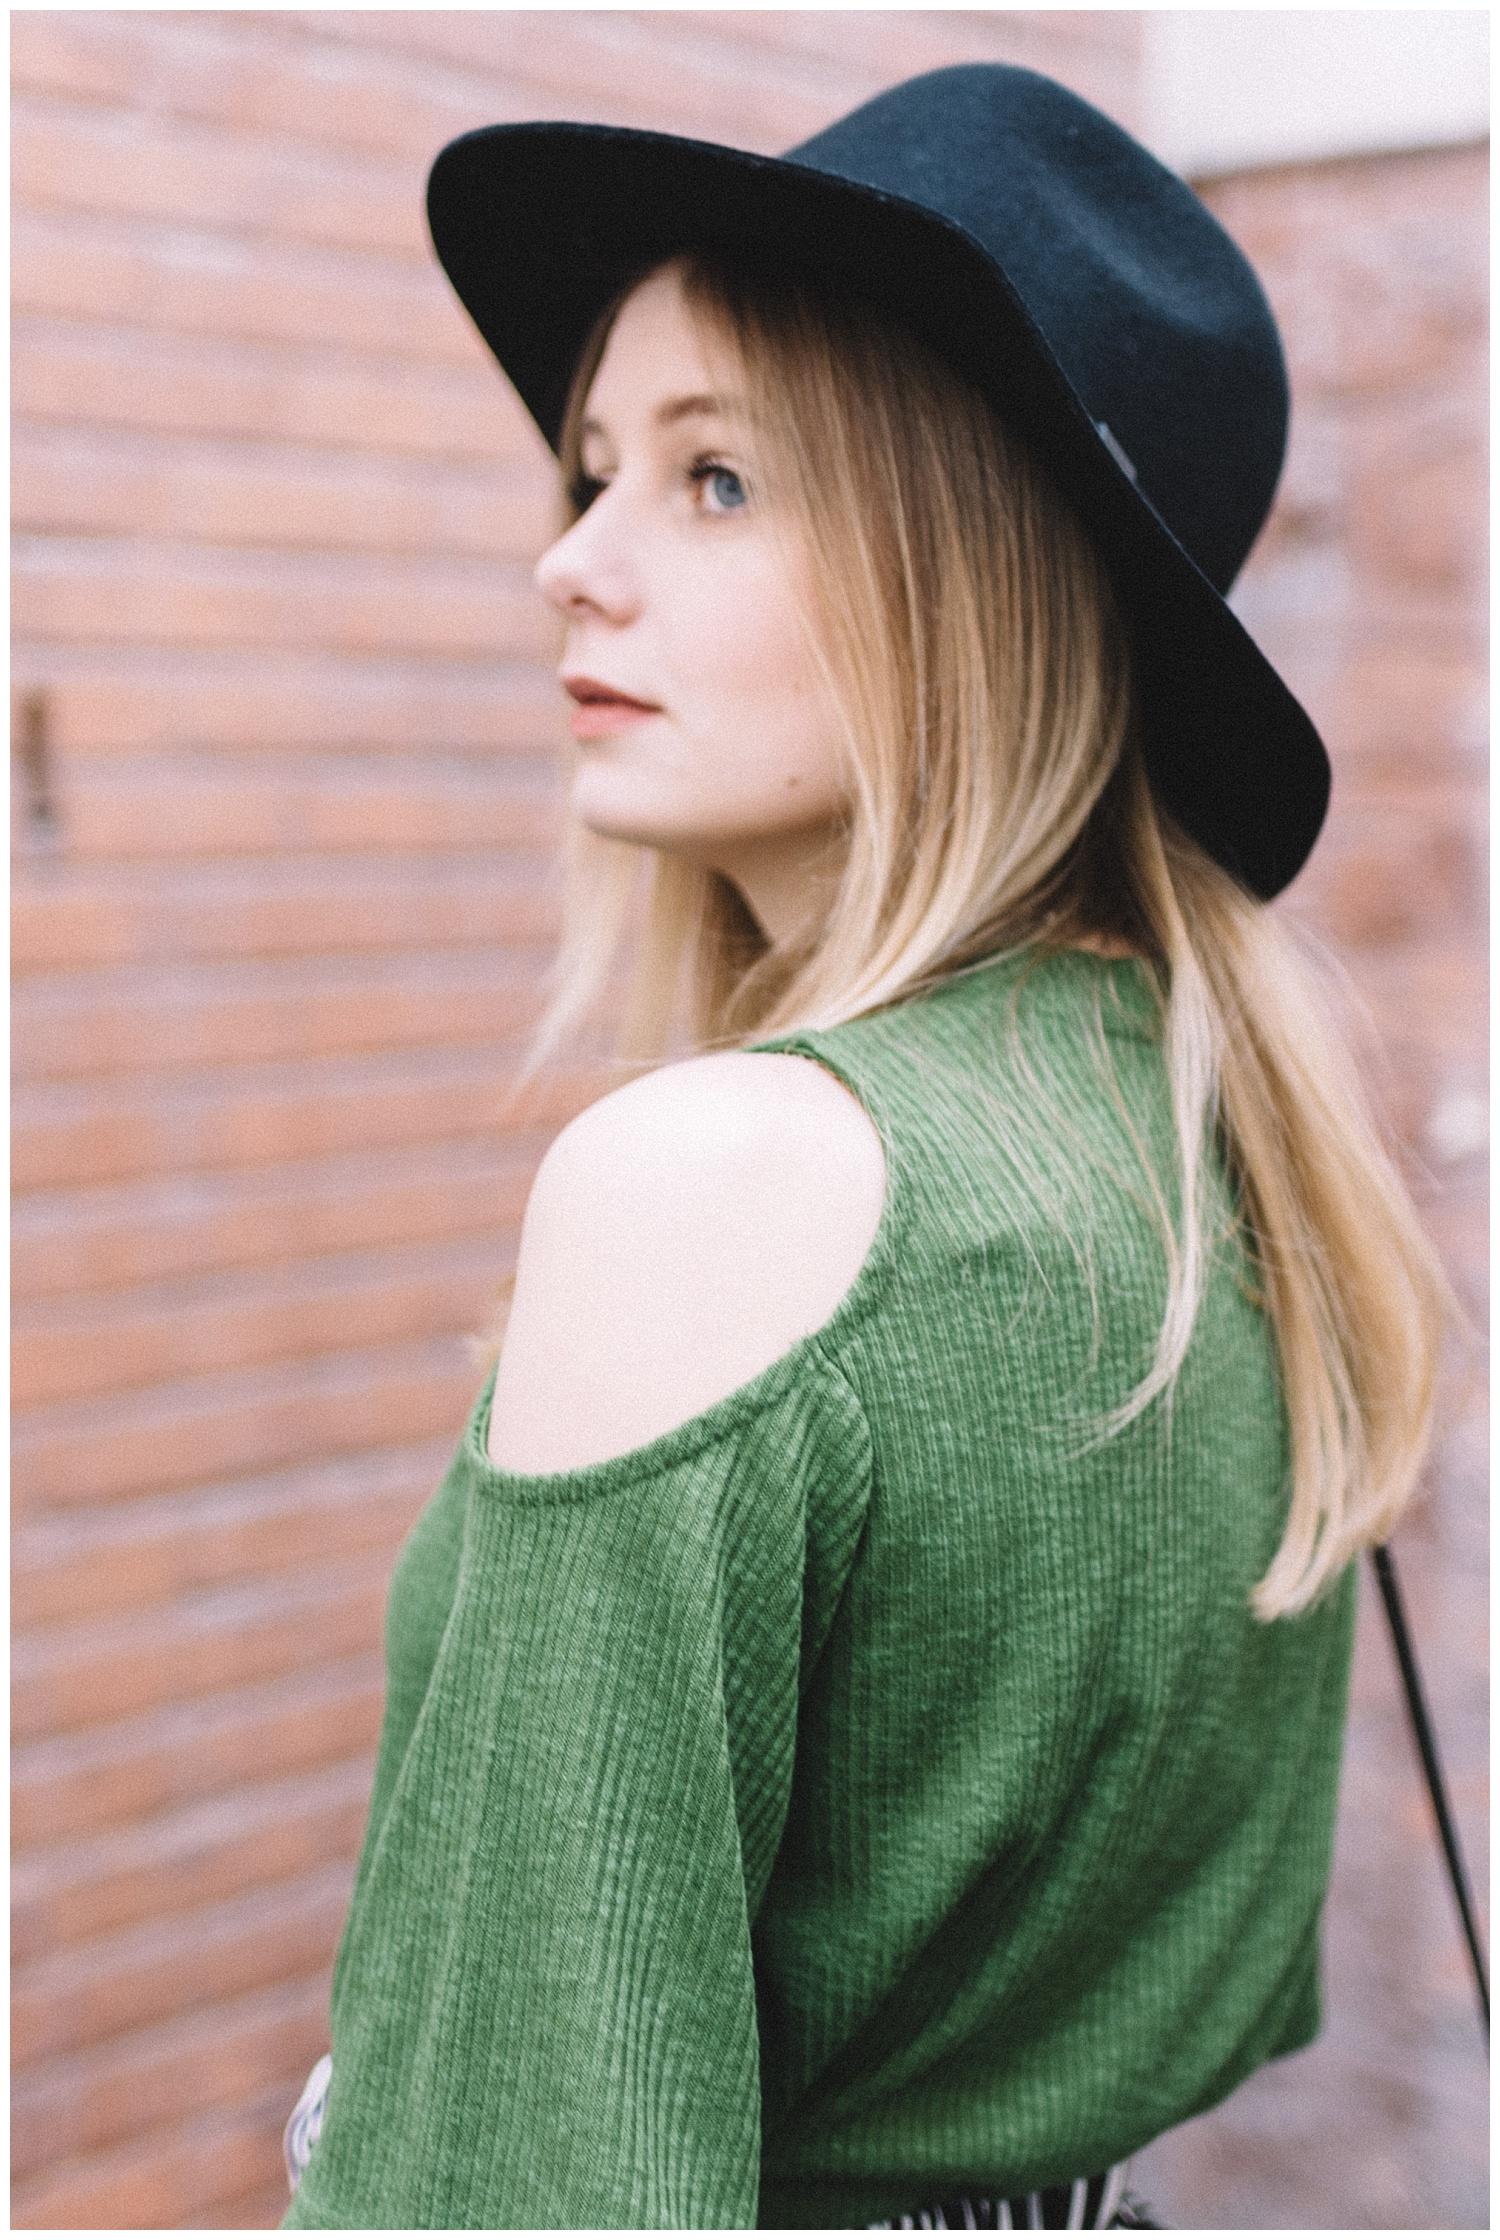 Camille_Lookbook_Fashion_Gaetan_Jargot_0004.jpg